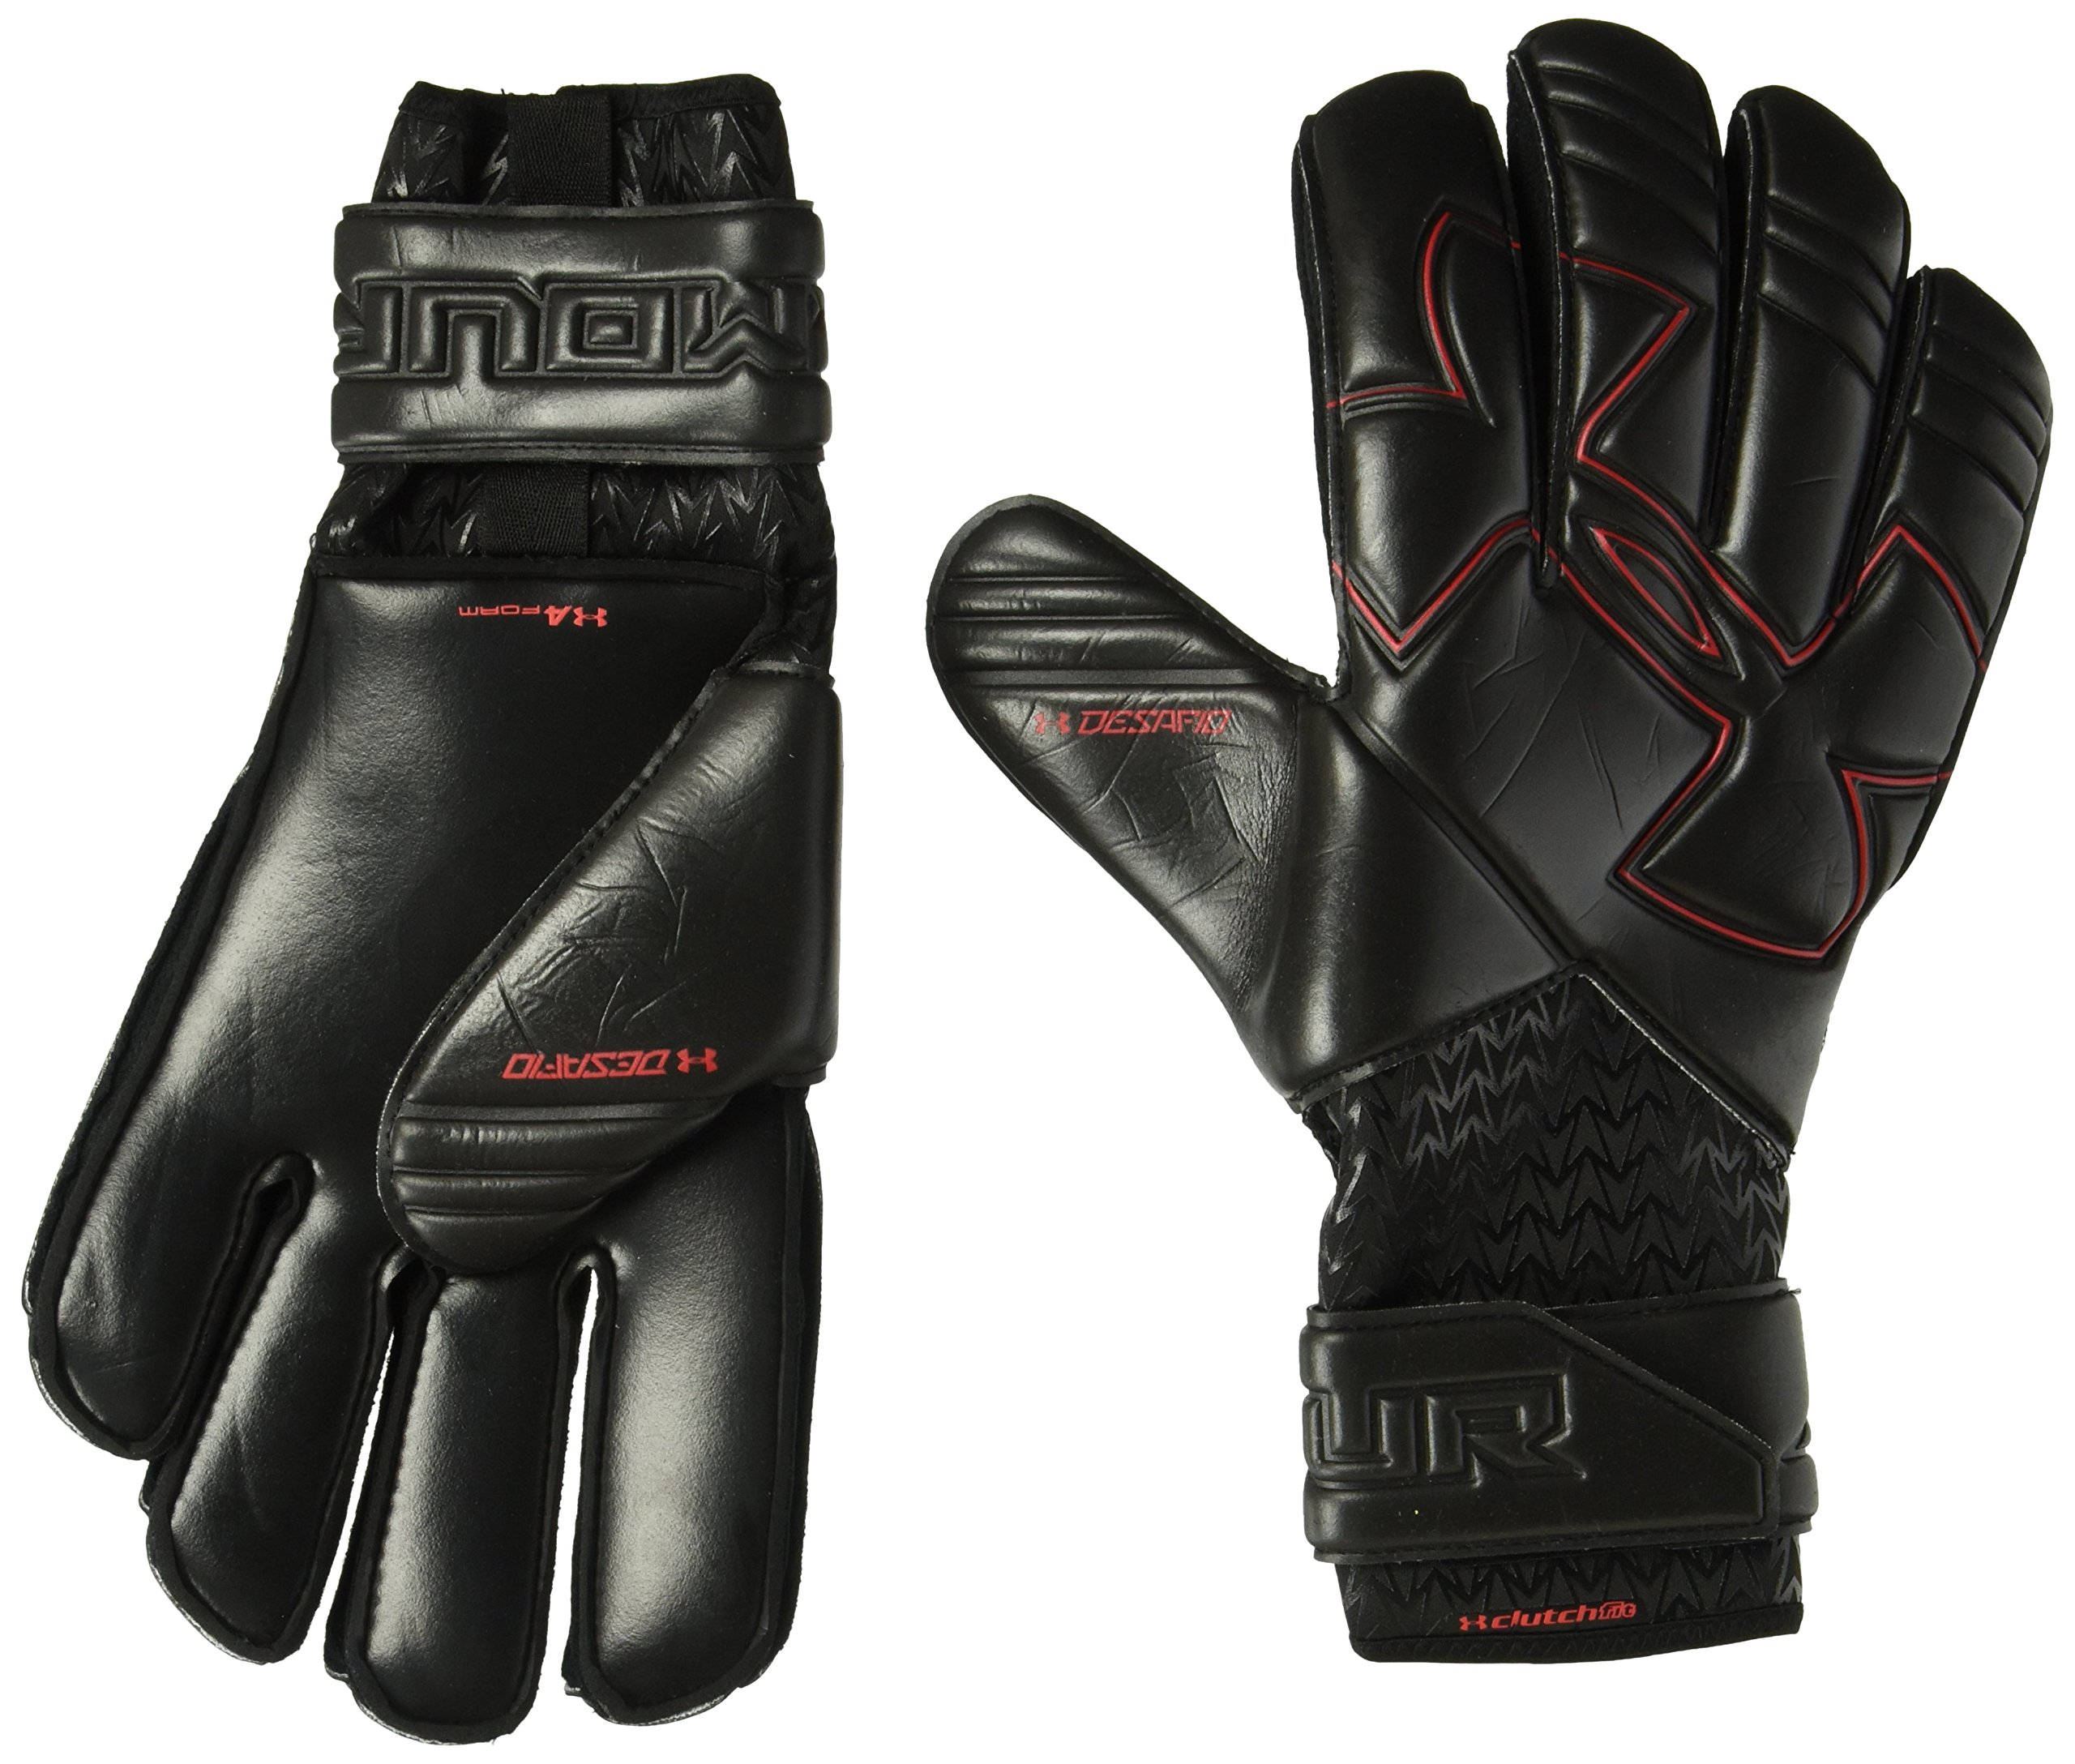 Under Armour Men's Desafio Pro Soccer Gloves, Black (001)/Black, 12